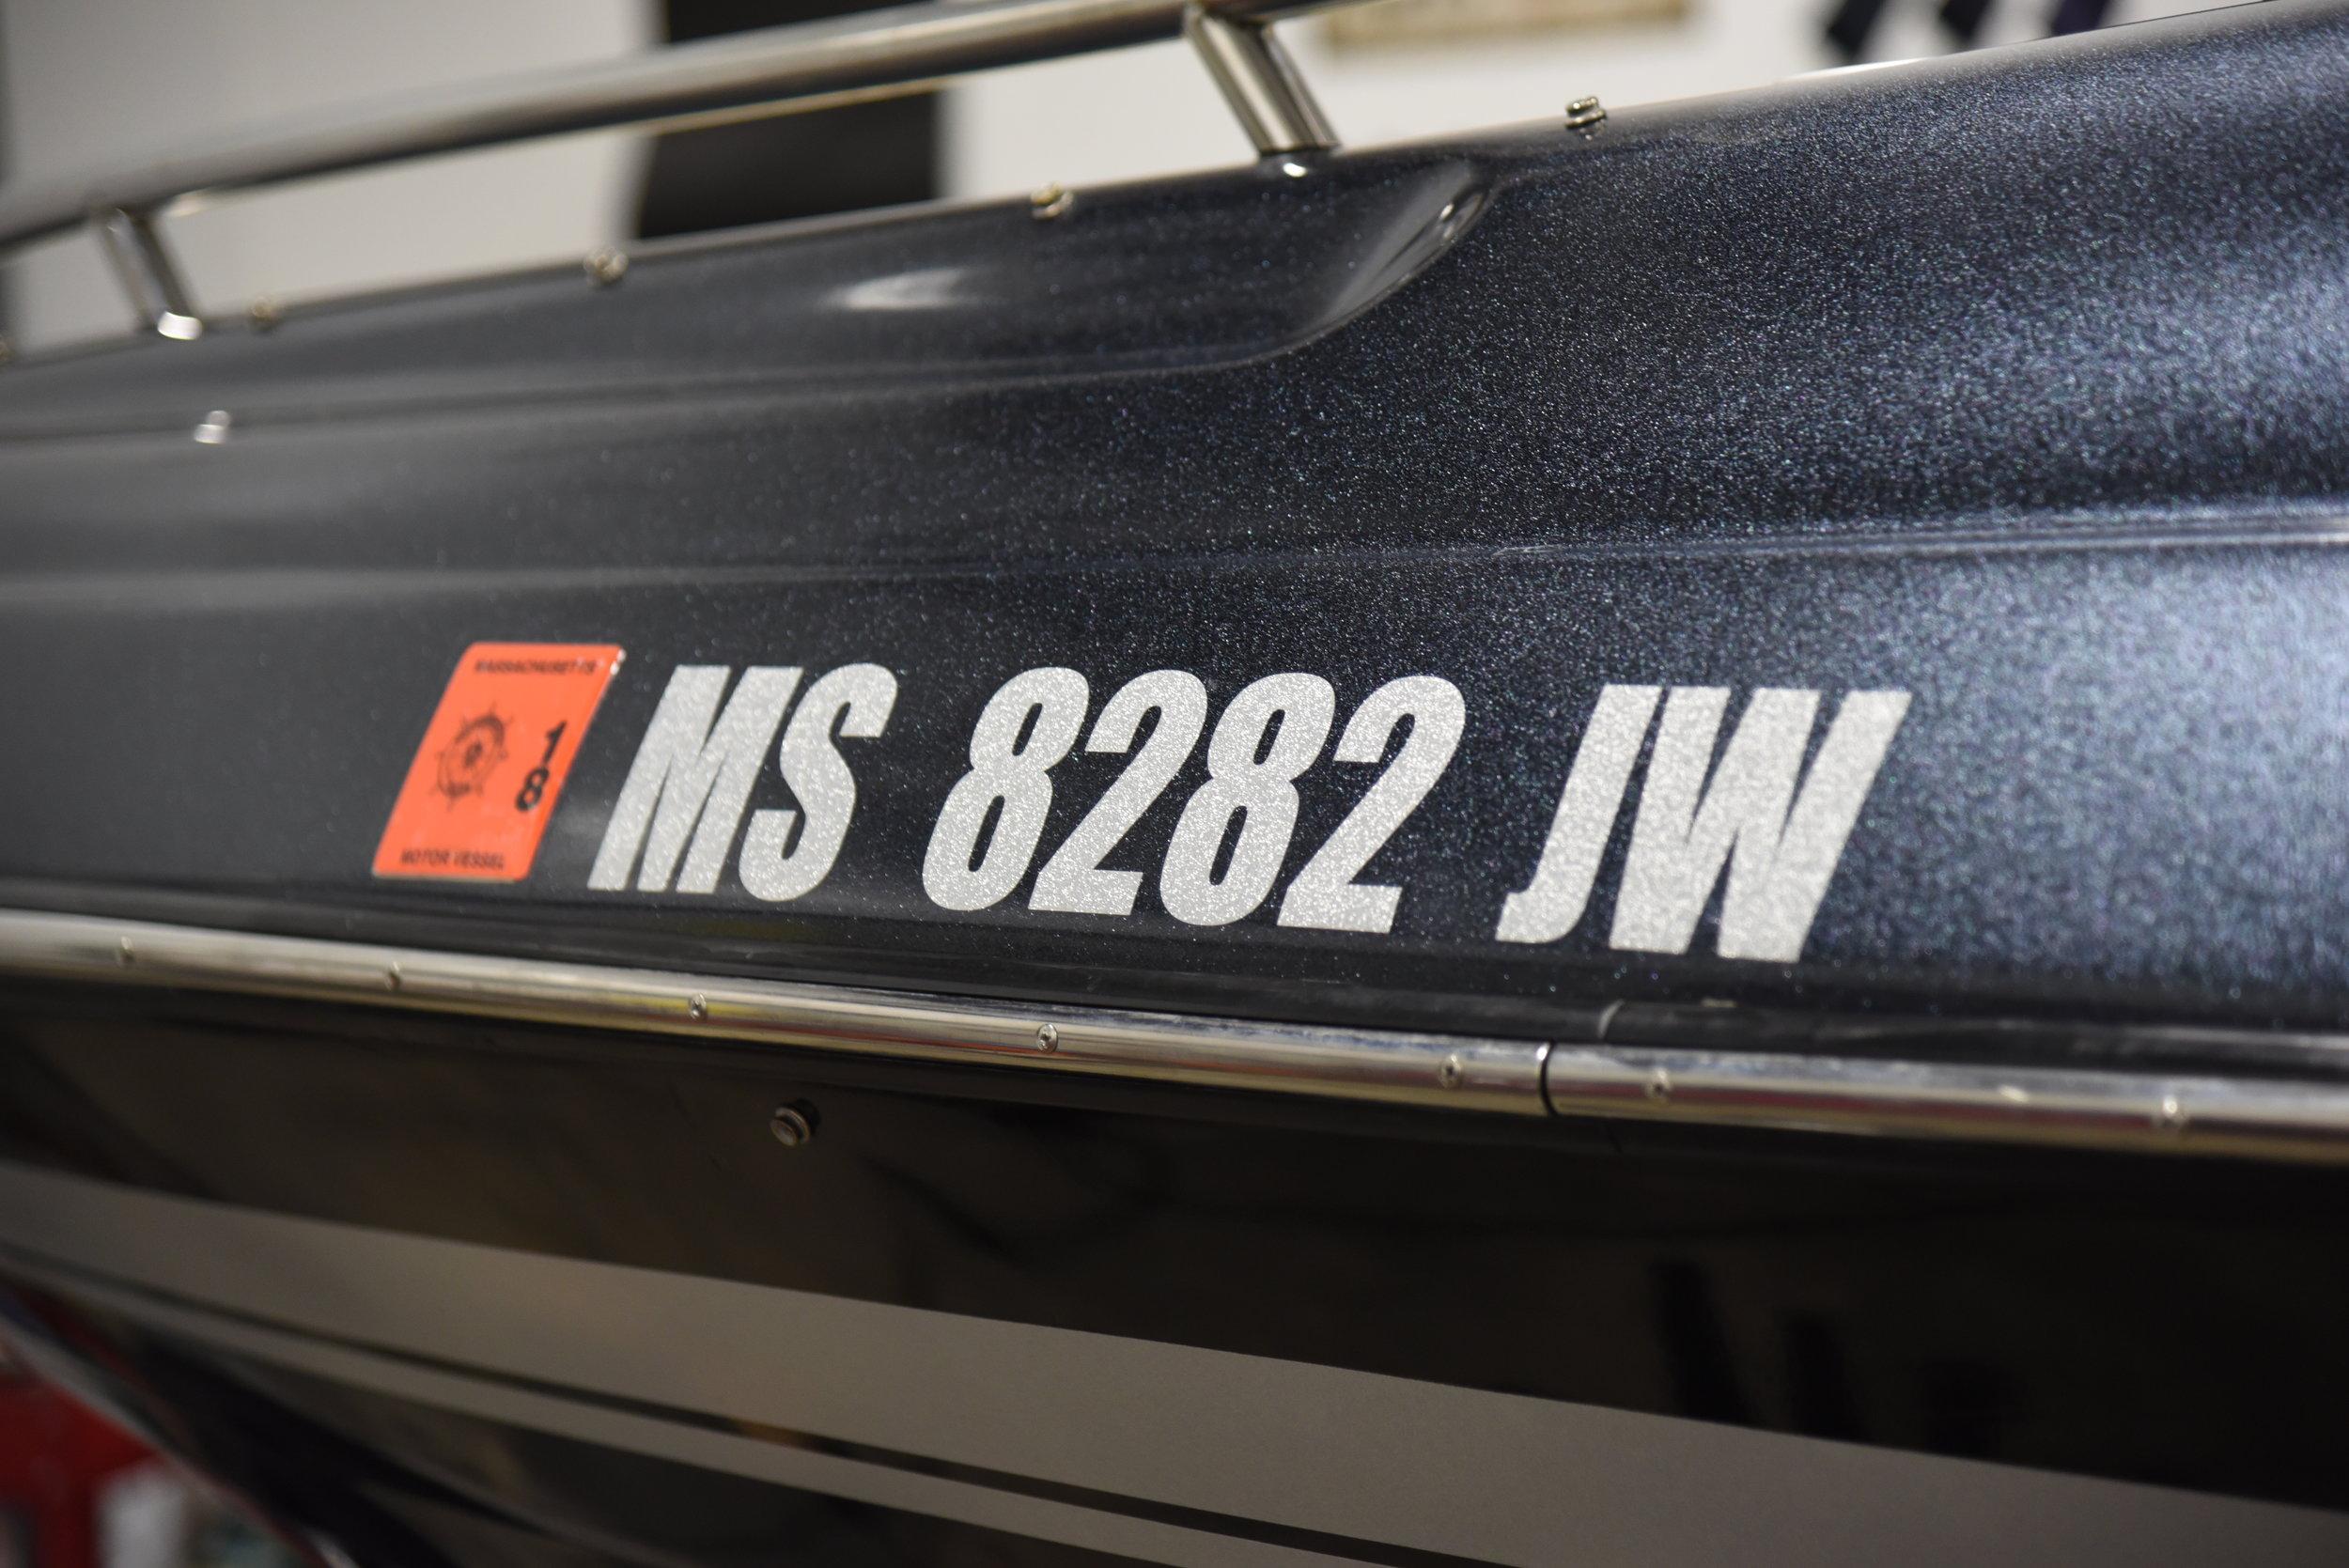 DSC_2945.JPG